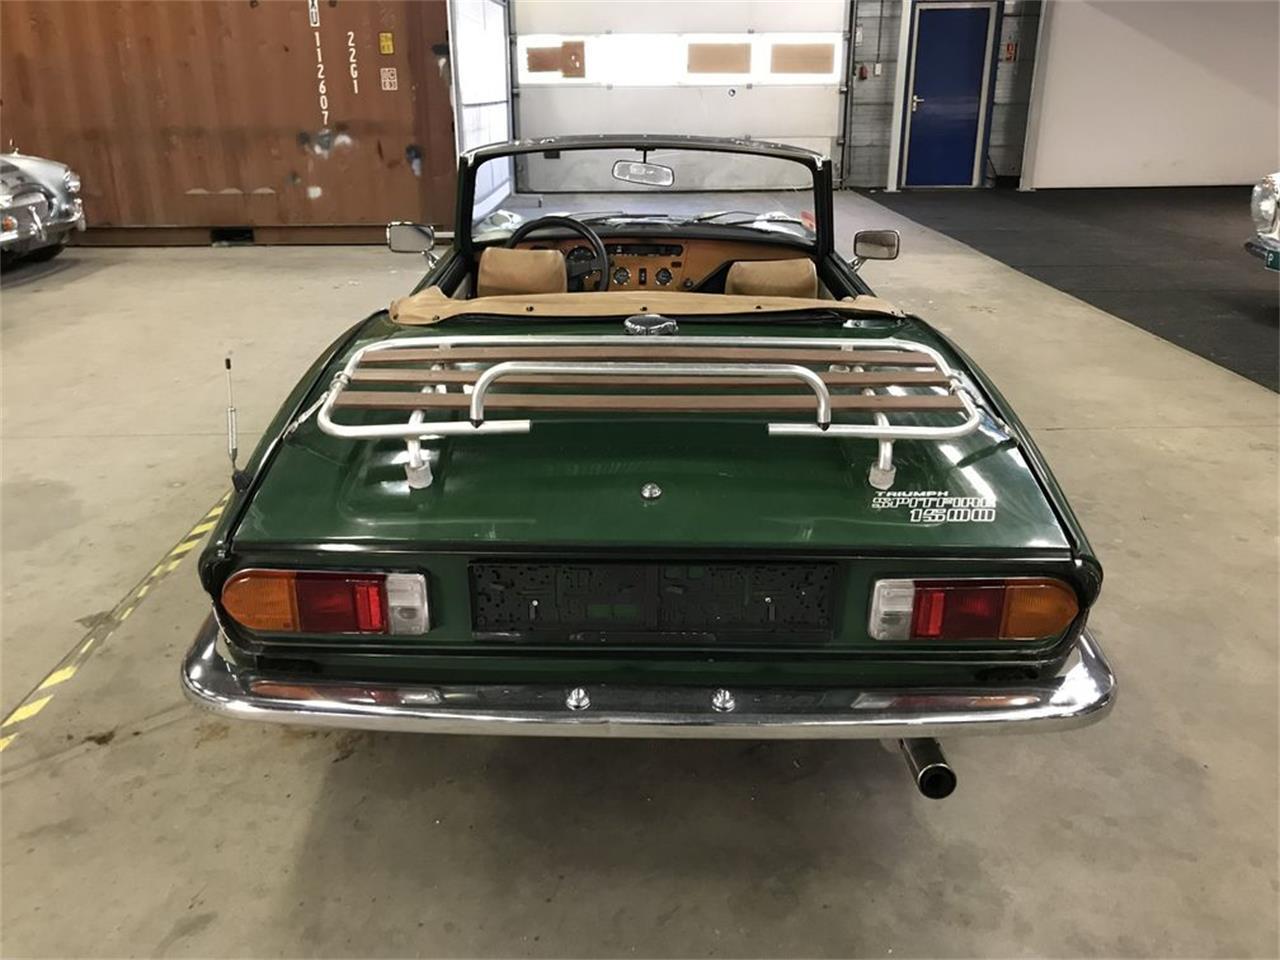 1980 Triumph Spitfire (CC-1419760) for sale in Waalwijk, Noord Brabant